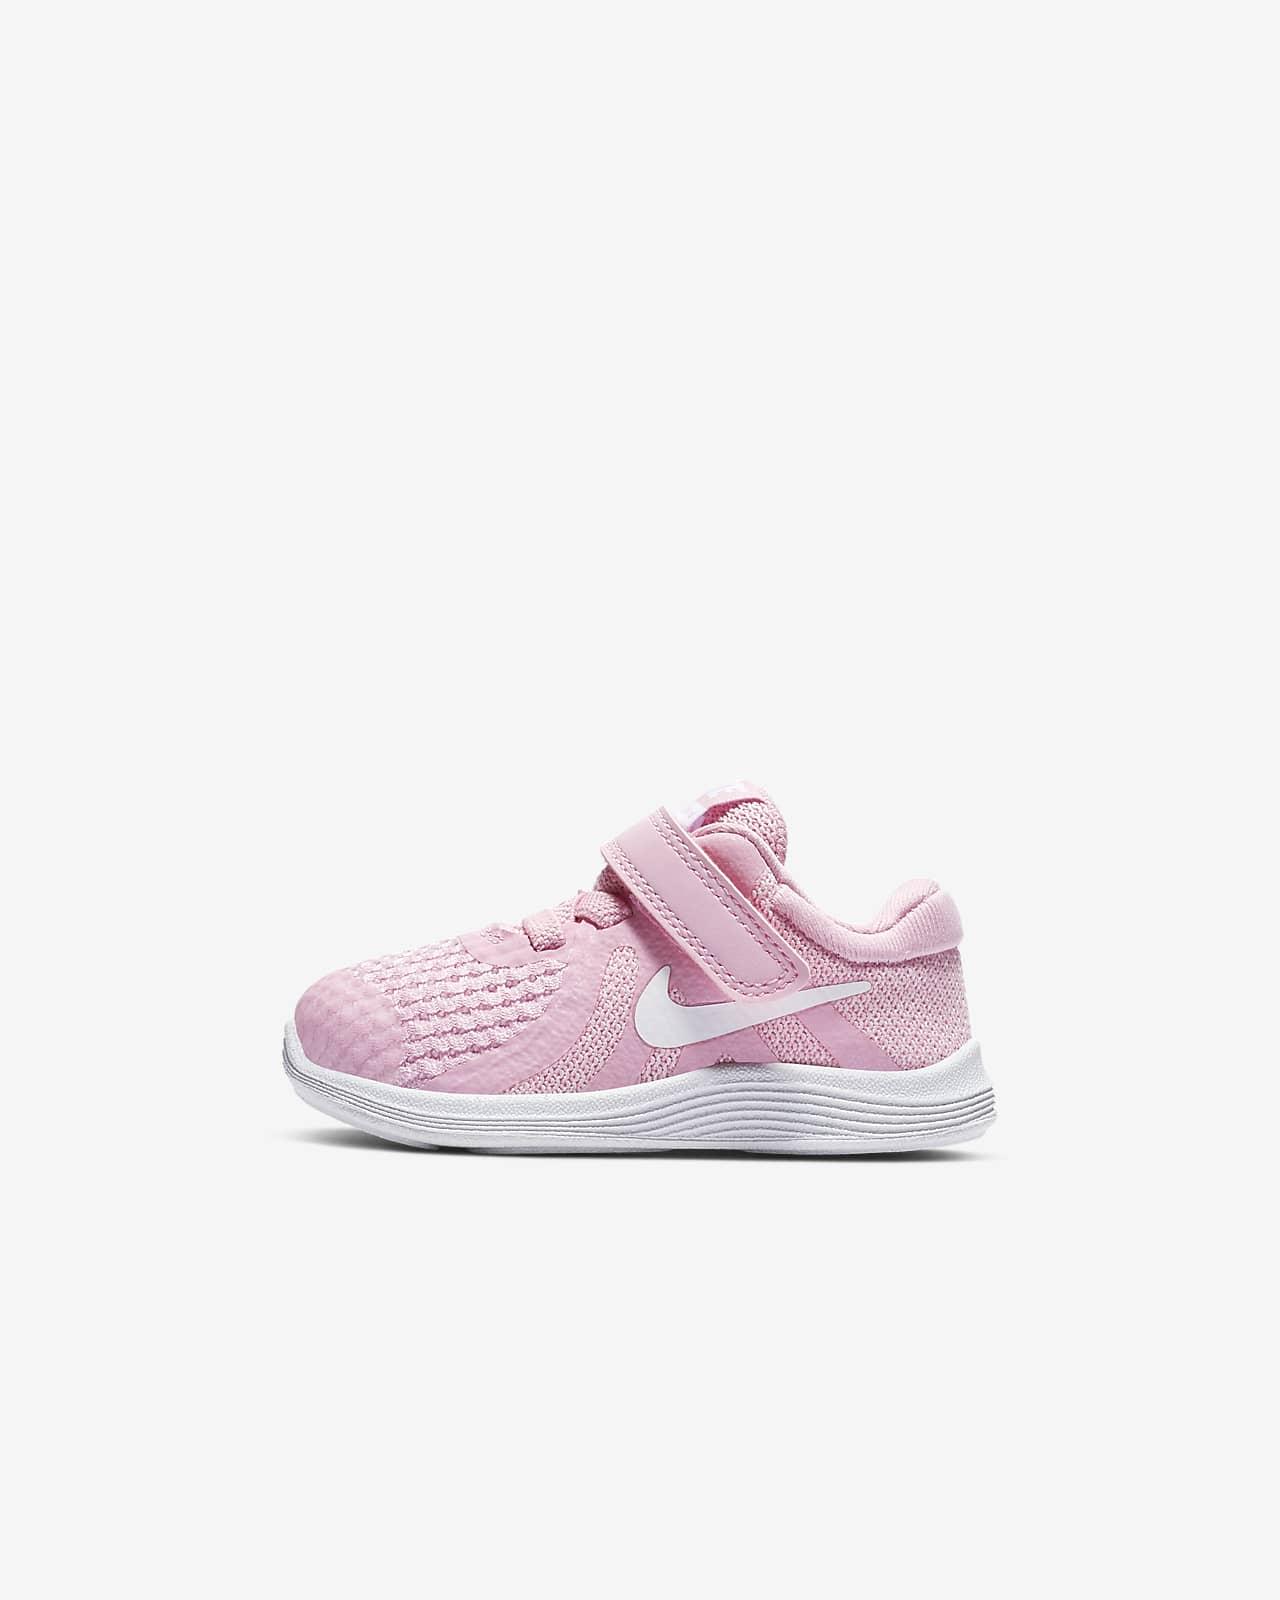 Ocultación Turismo Otoño  Nike Revolution 4 Baby & Toddler Shoe. Nike MA